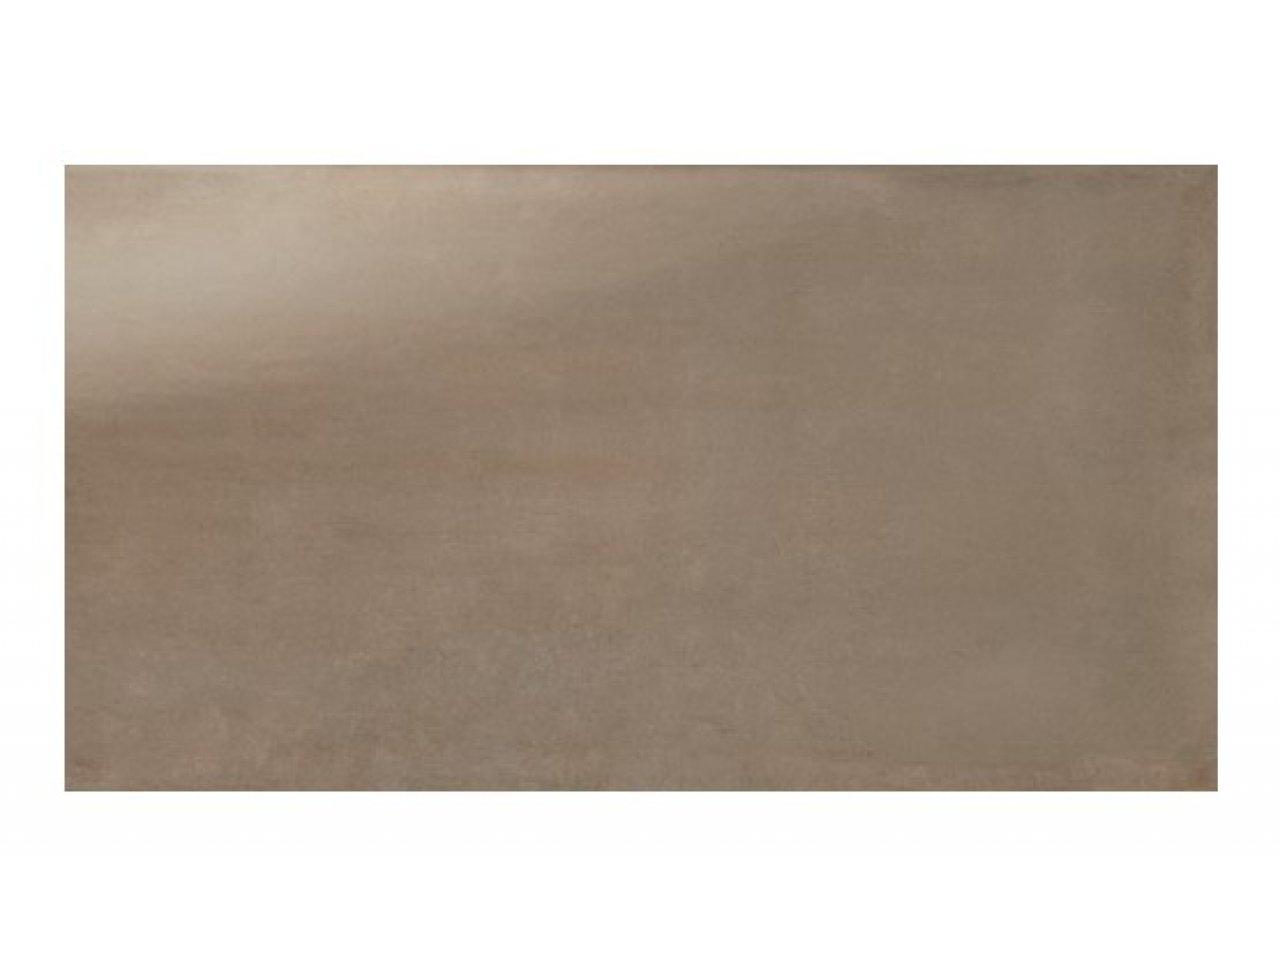 Настенная плитка FAP Frame Earth 30.5 x 56 см, Арт. fLEI